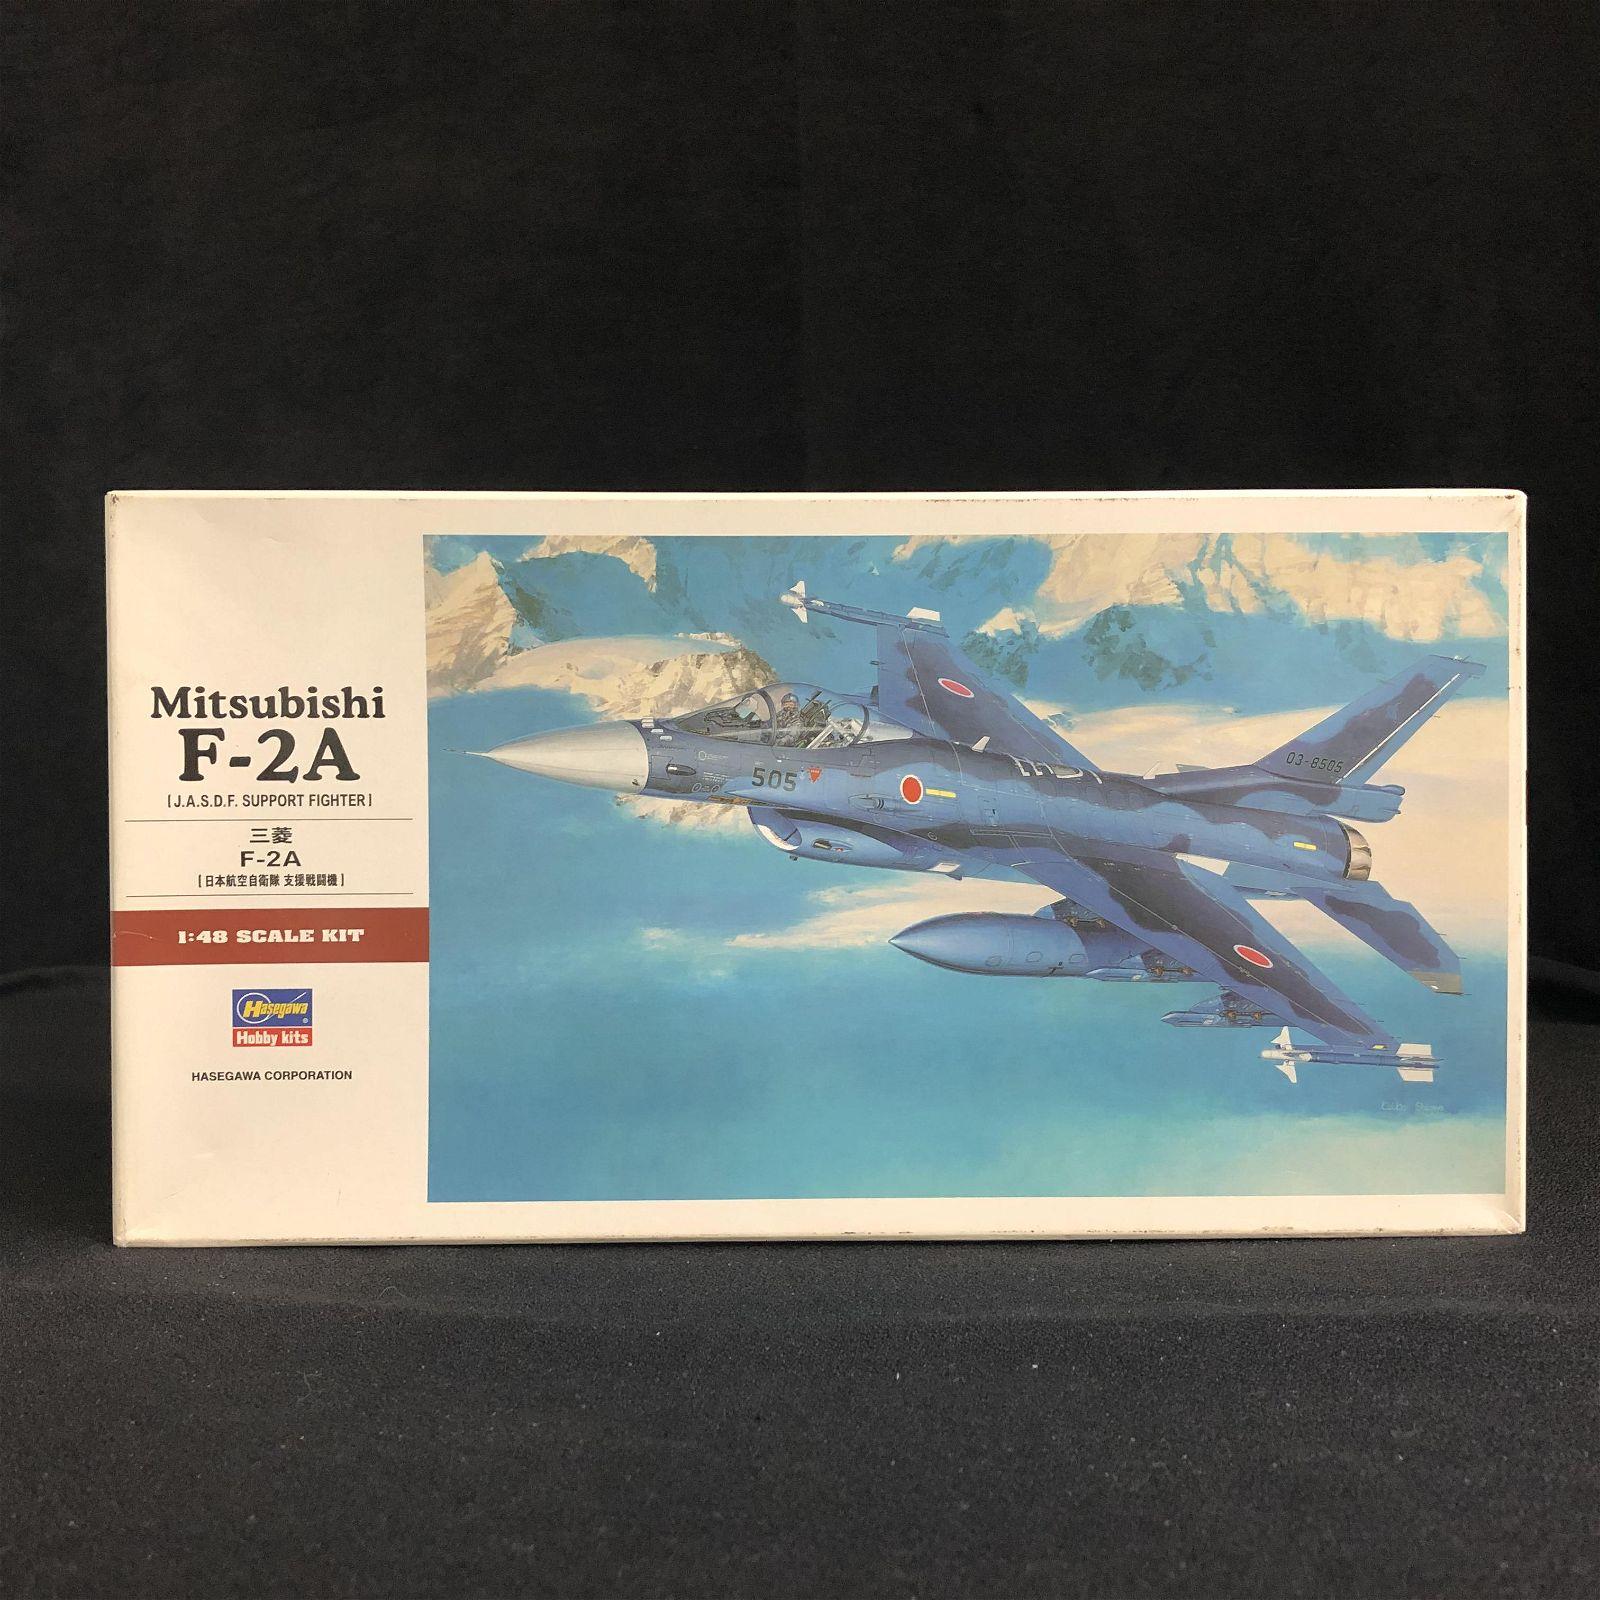 MINT CONDITION F-2A MITSUBISHI MODEL KIT